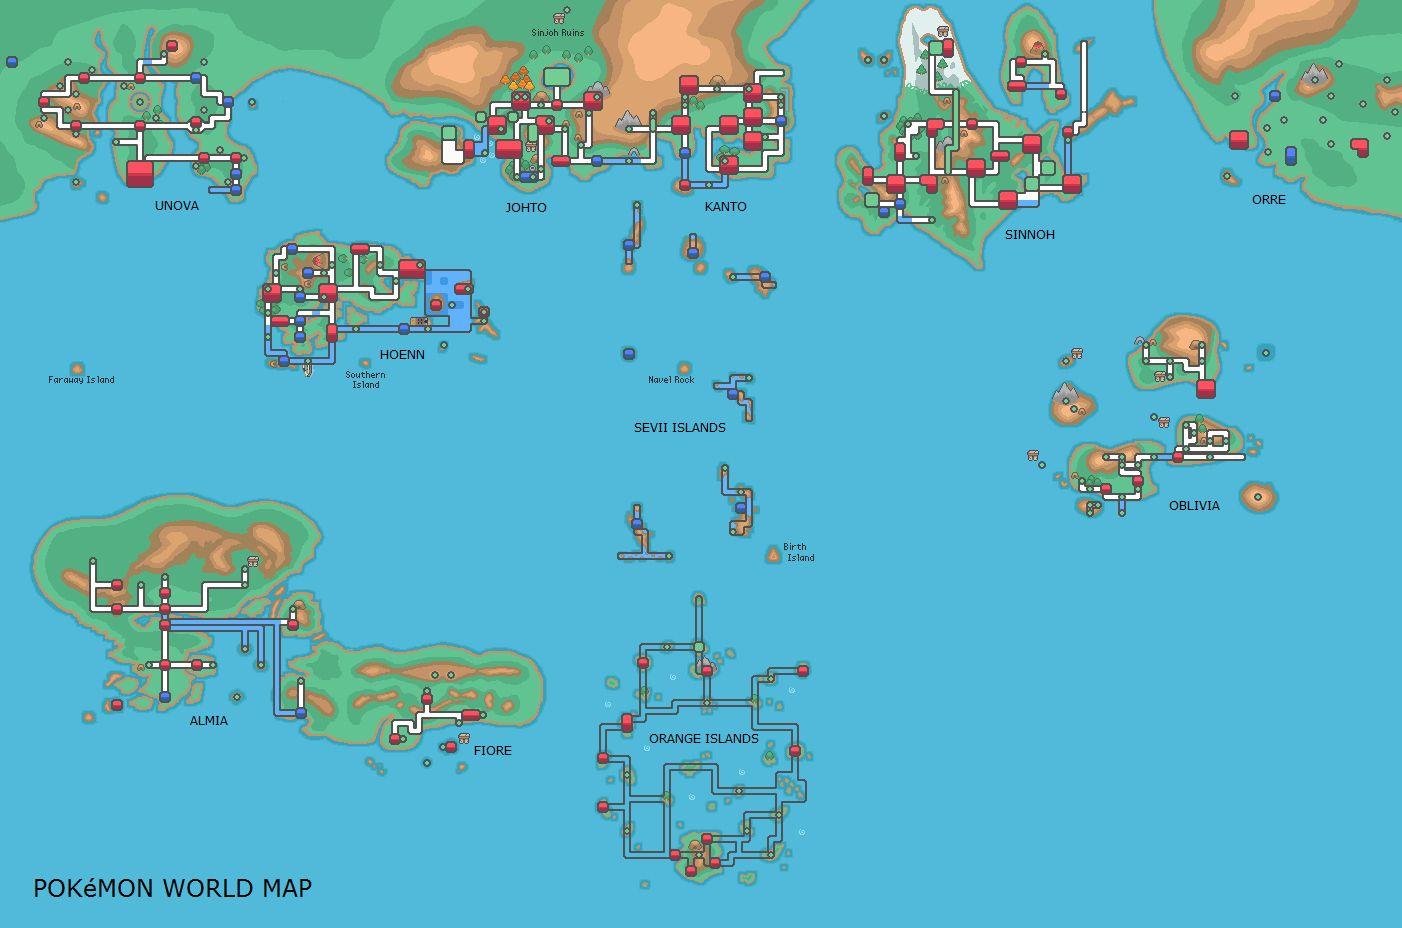 Pokemon world map | Misc. pictures | Pokémon, Video game memes ...